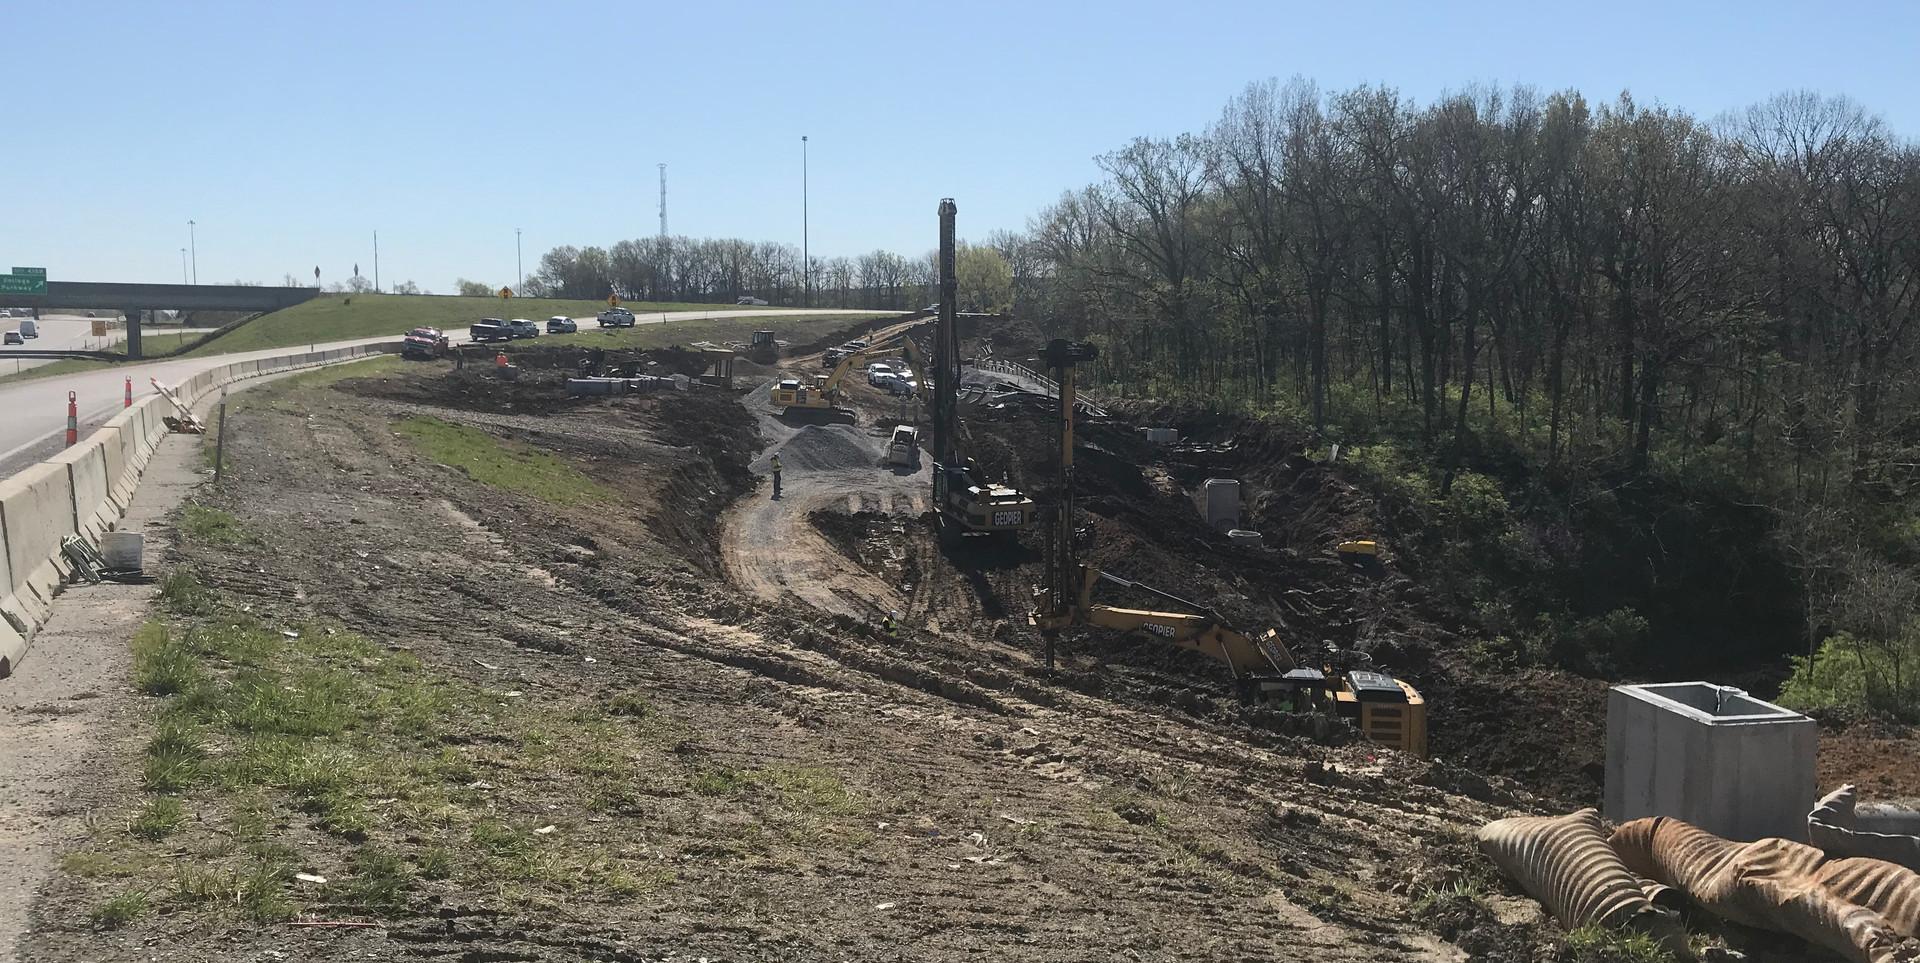 2020-04-21_Grading work near WB I70 to SB Turner Ramp.JPG